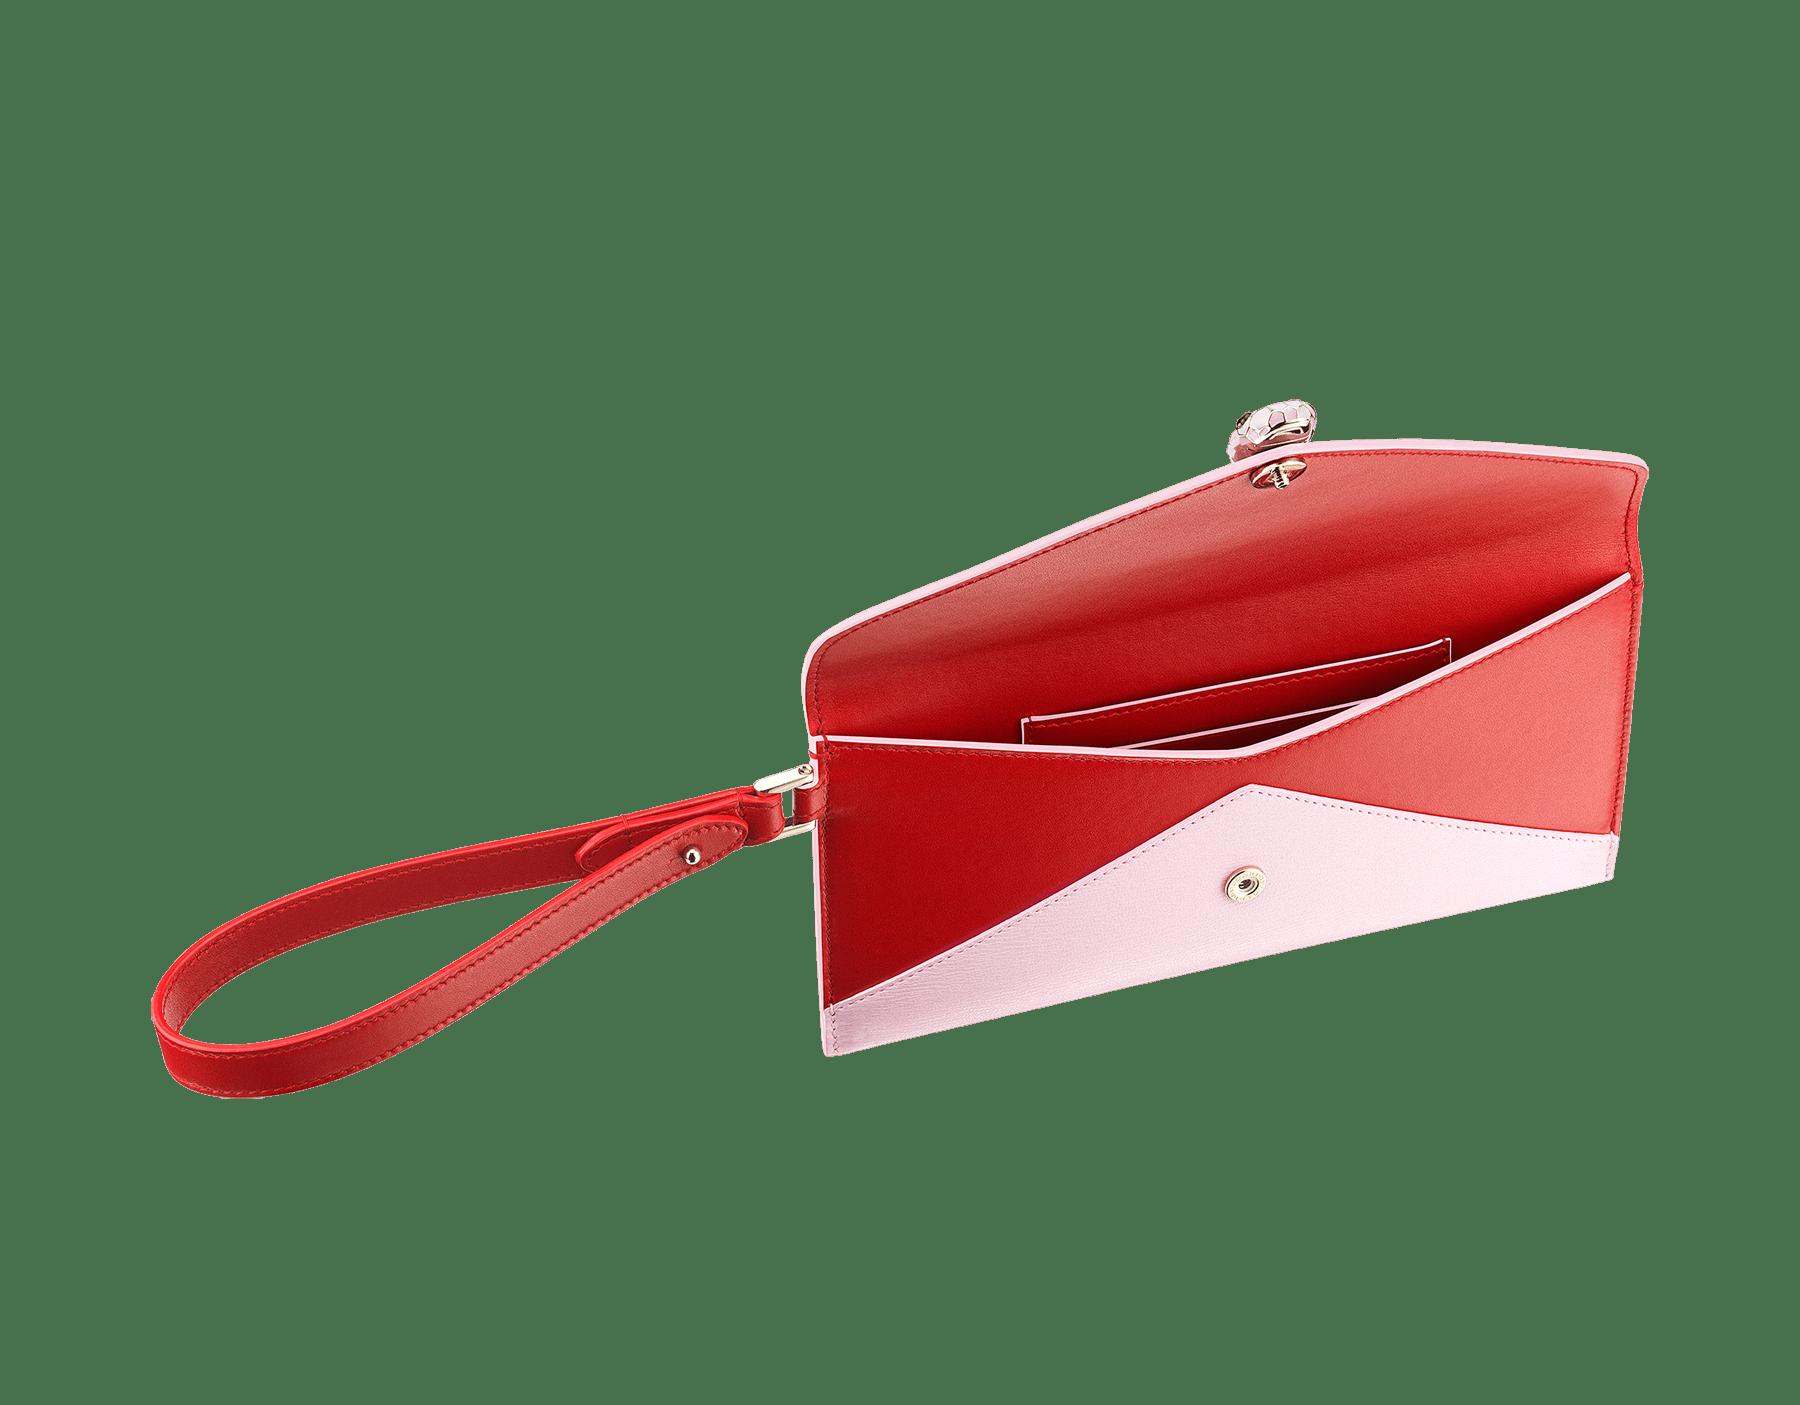 Serpenti Forever 信封型手拿包,採用洋紅碧玉色小牛皮和法國玫瑰色羊皮。經典蛇頭元素飾以法國玫瑰色和洋紅碧玉色琺瑯,蛇眼鑲飾黑色縞瑪瑙。 289461 image 2